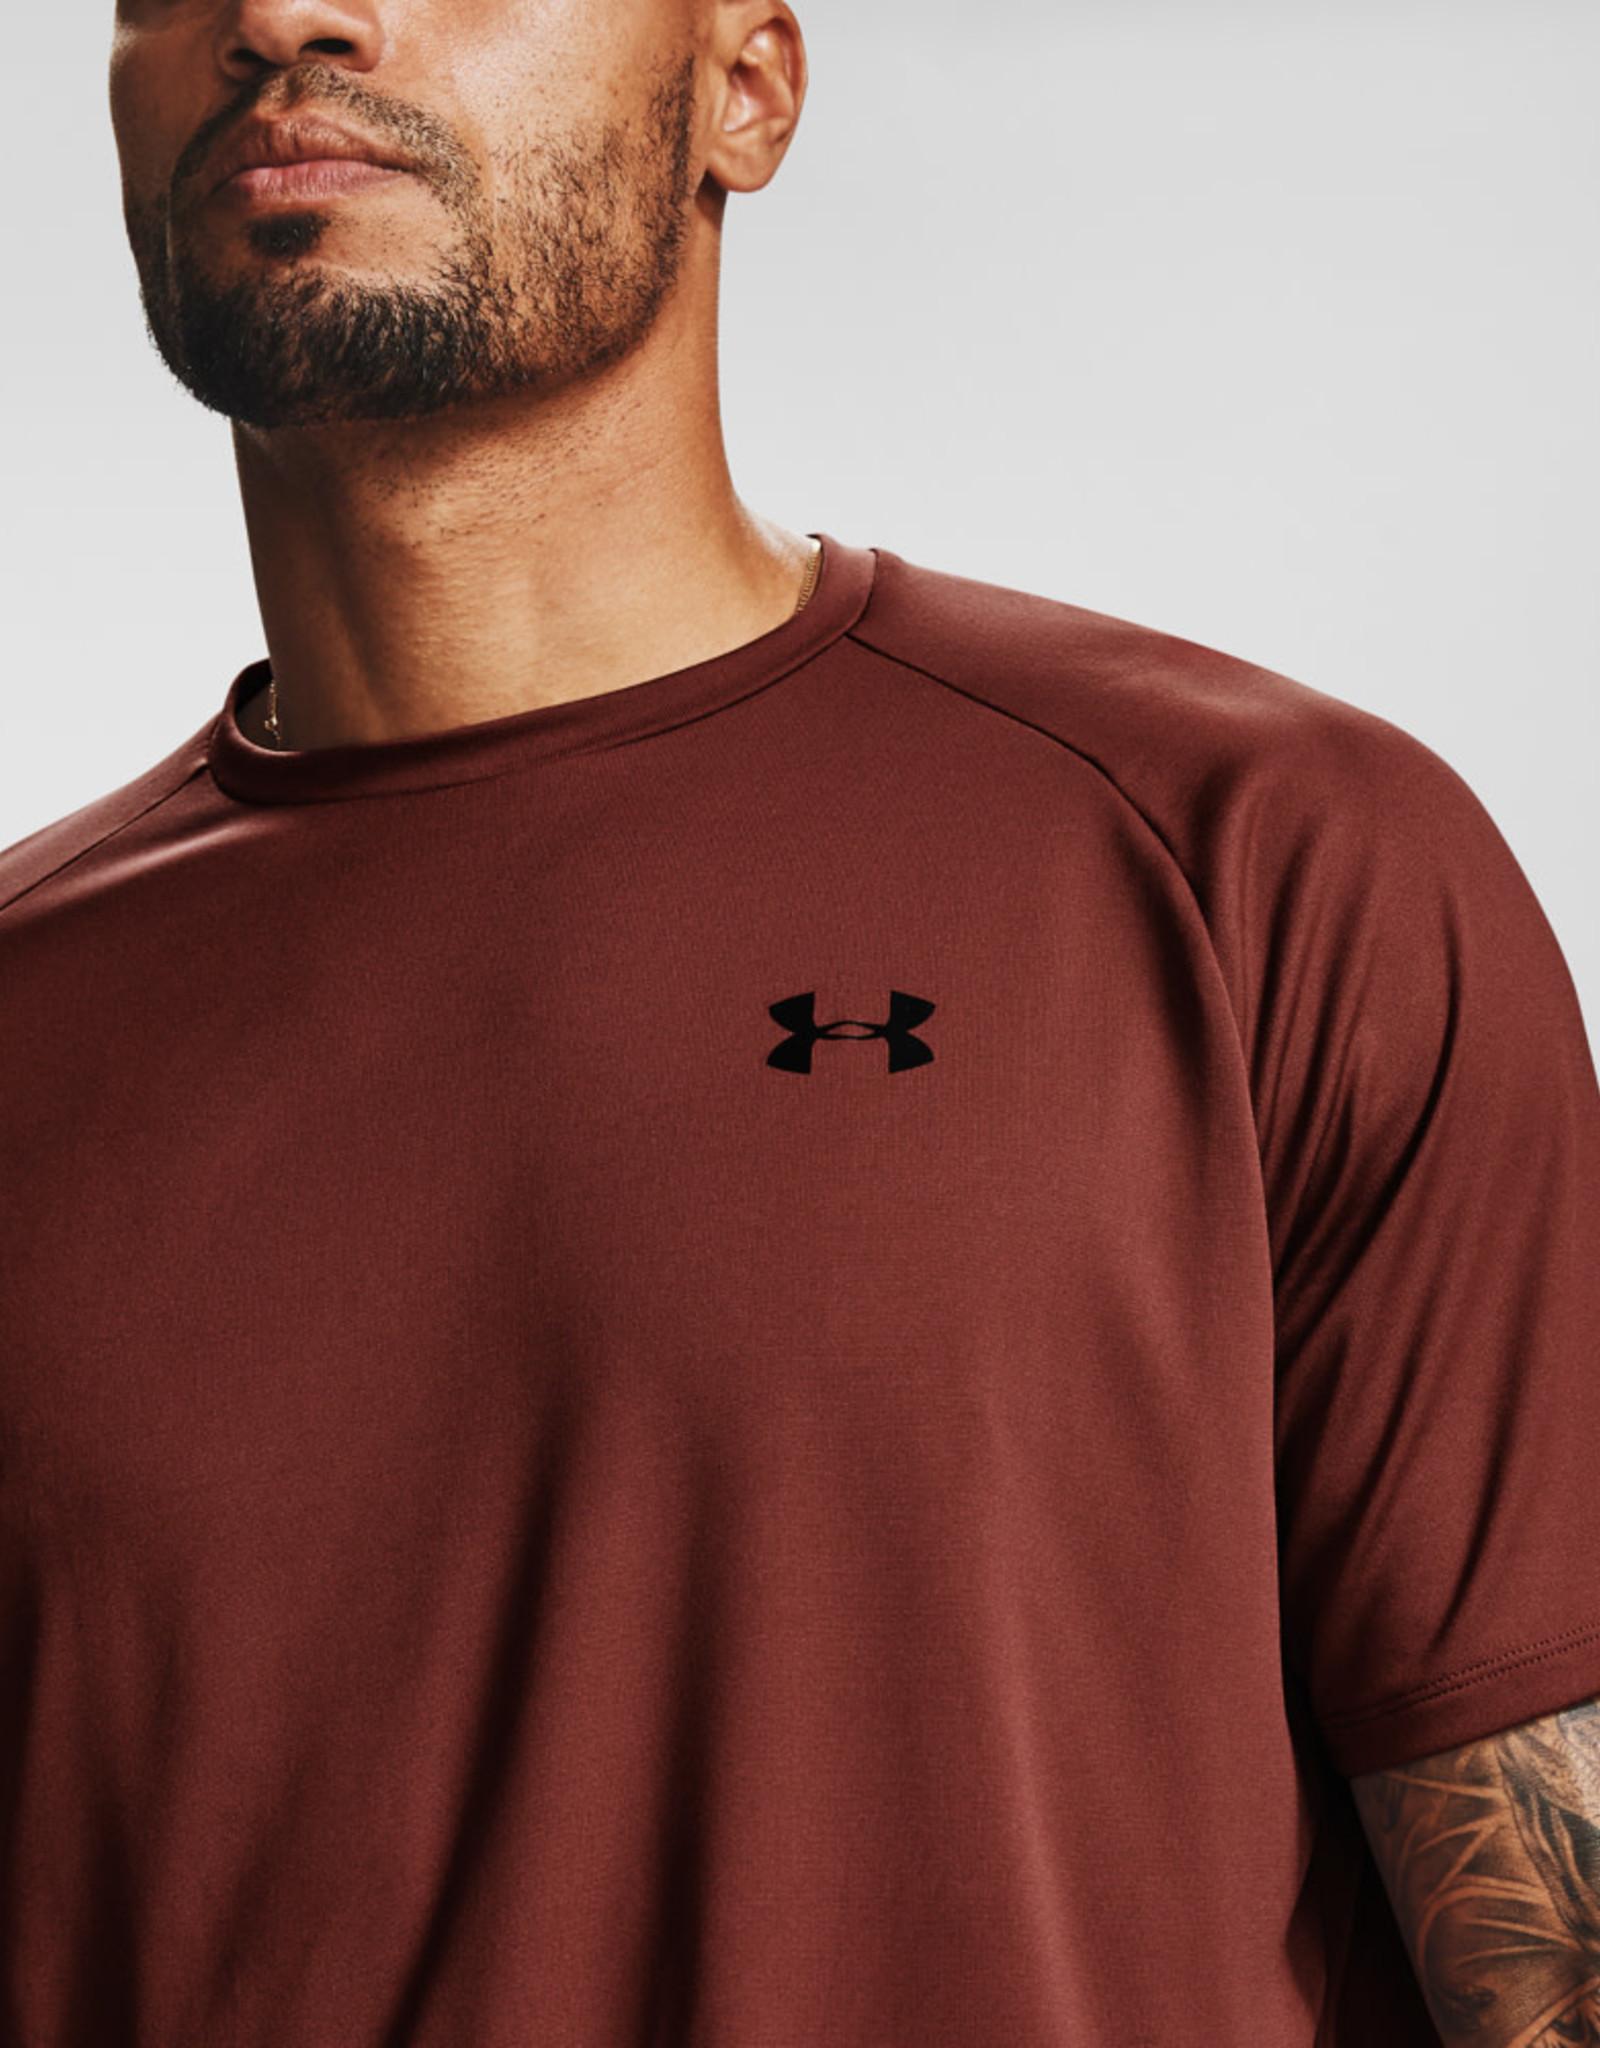 Under Armour Men's UA Tech Tee - Cinna Red--Black